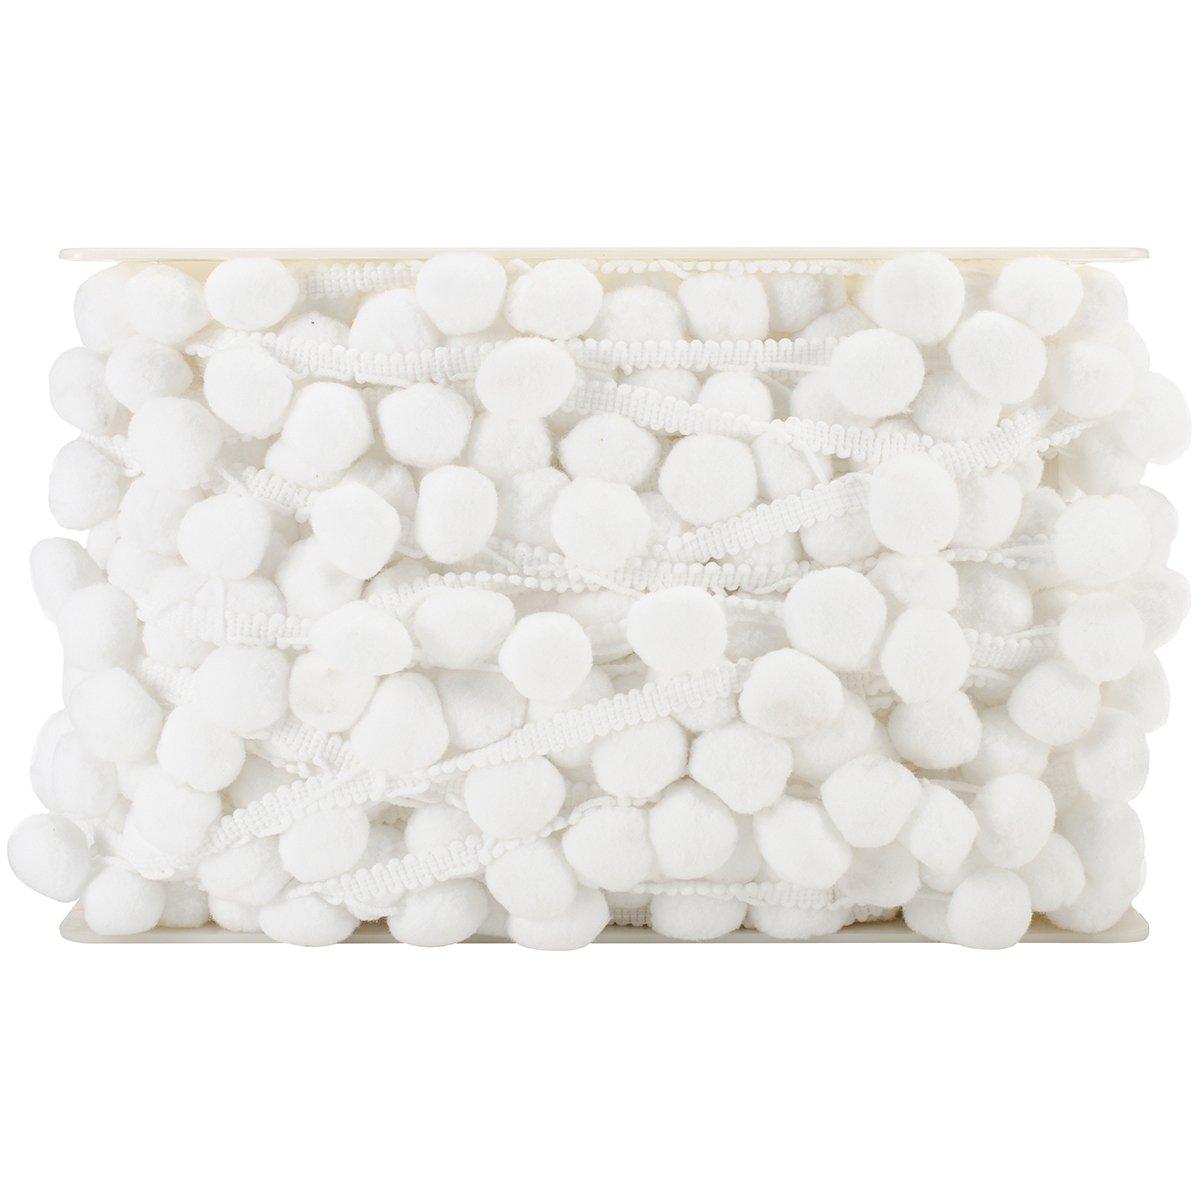 Expo Bonita Pom Pom Fringe 1 – 1/2-inch x 20YD Blanco, Color Blanco, 20YD acrílico aae9ae